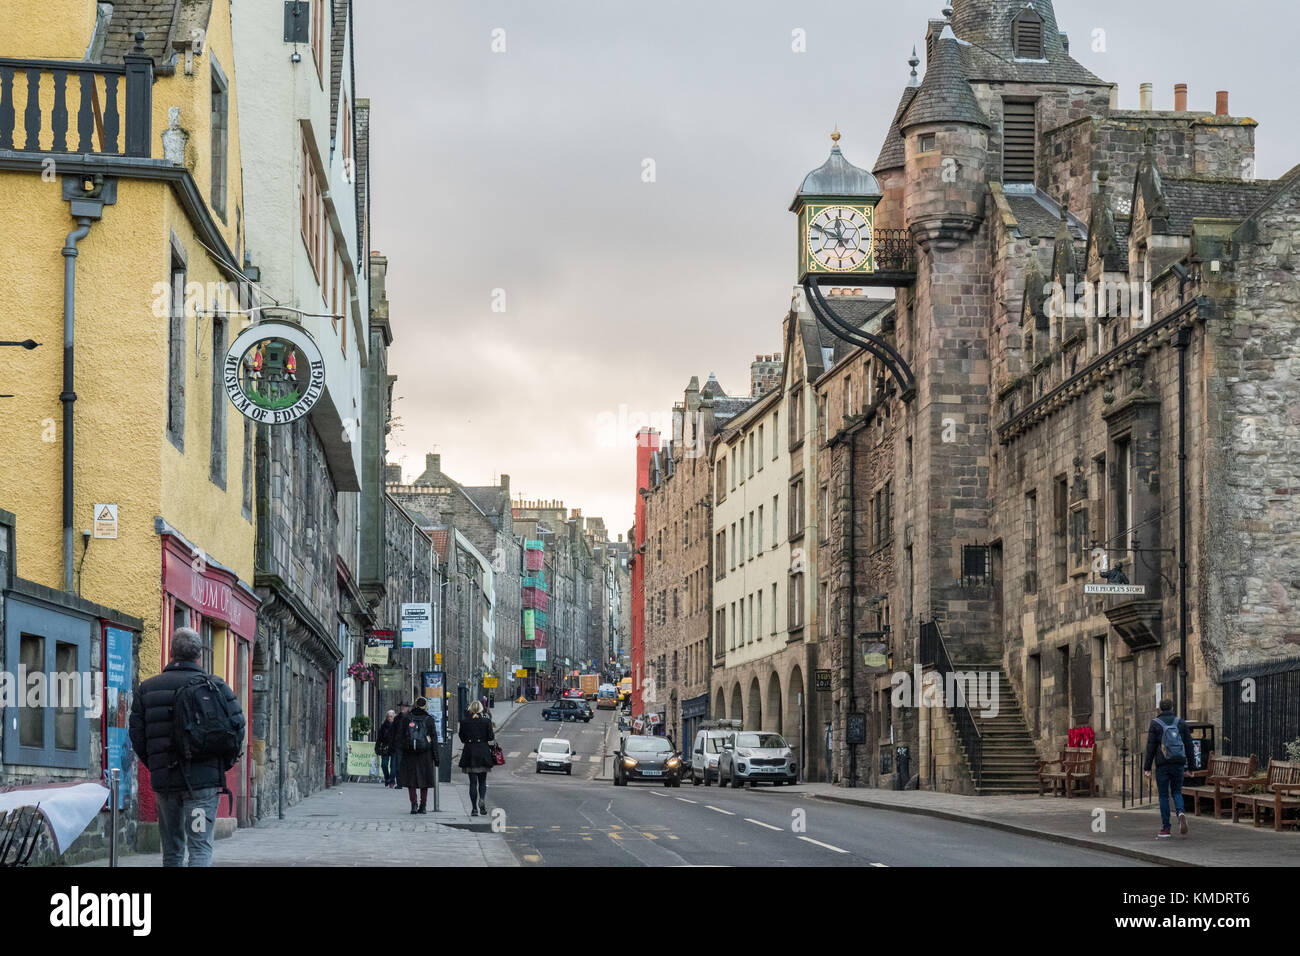 Edinburgh Royal Mile, Canongate, Edinburgh, Scotland, UK - Stock Image